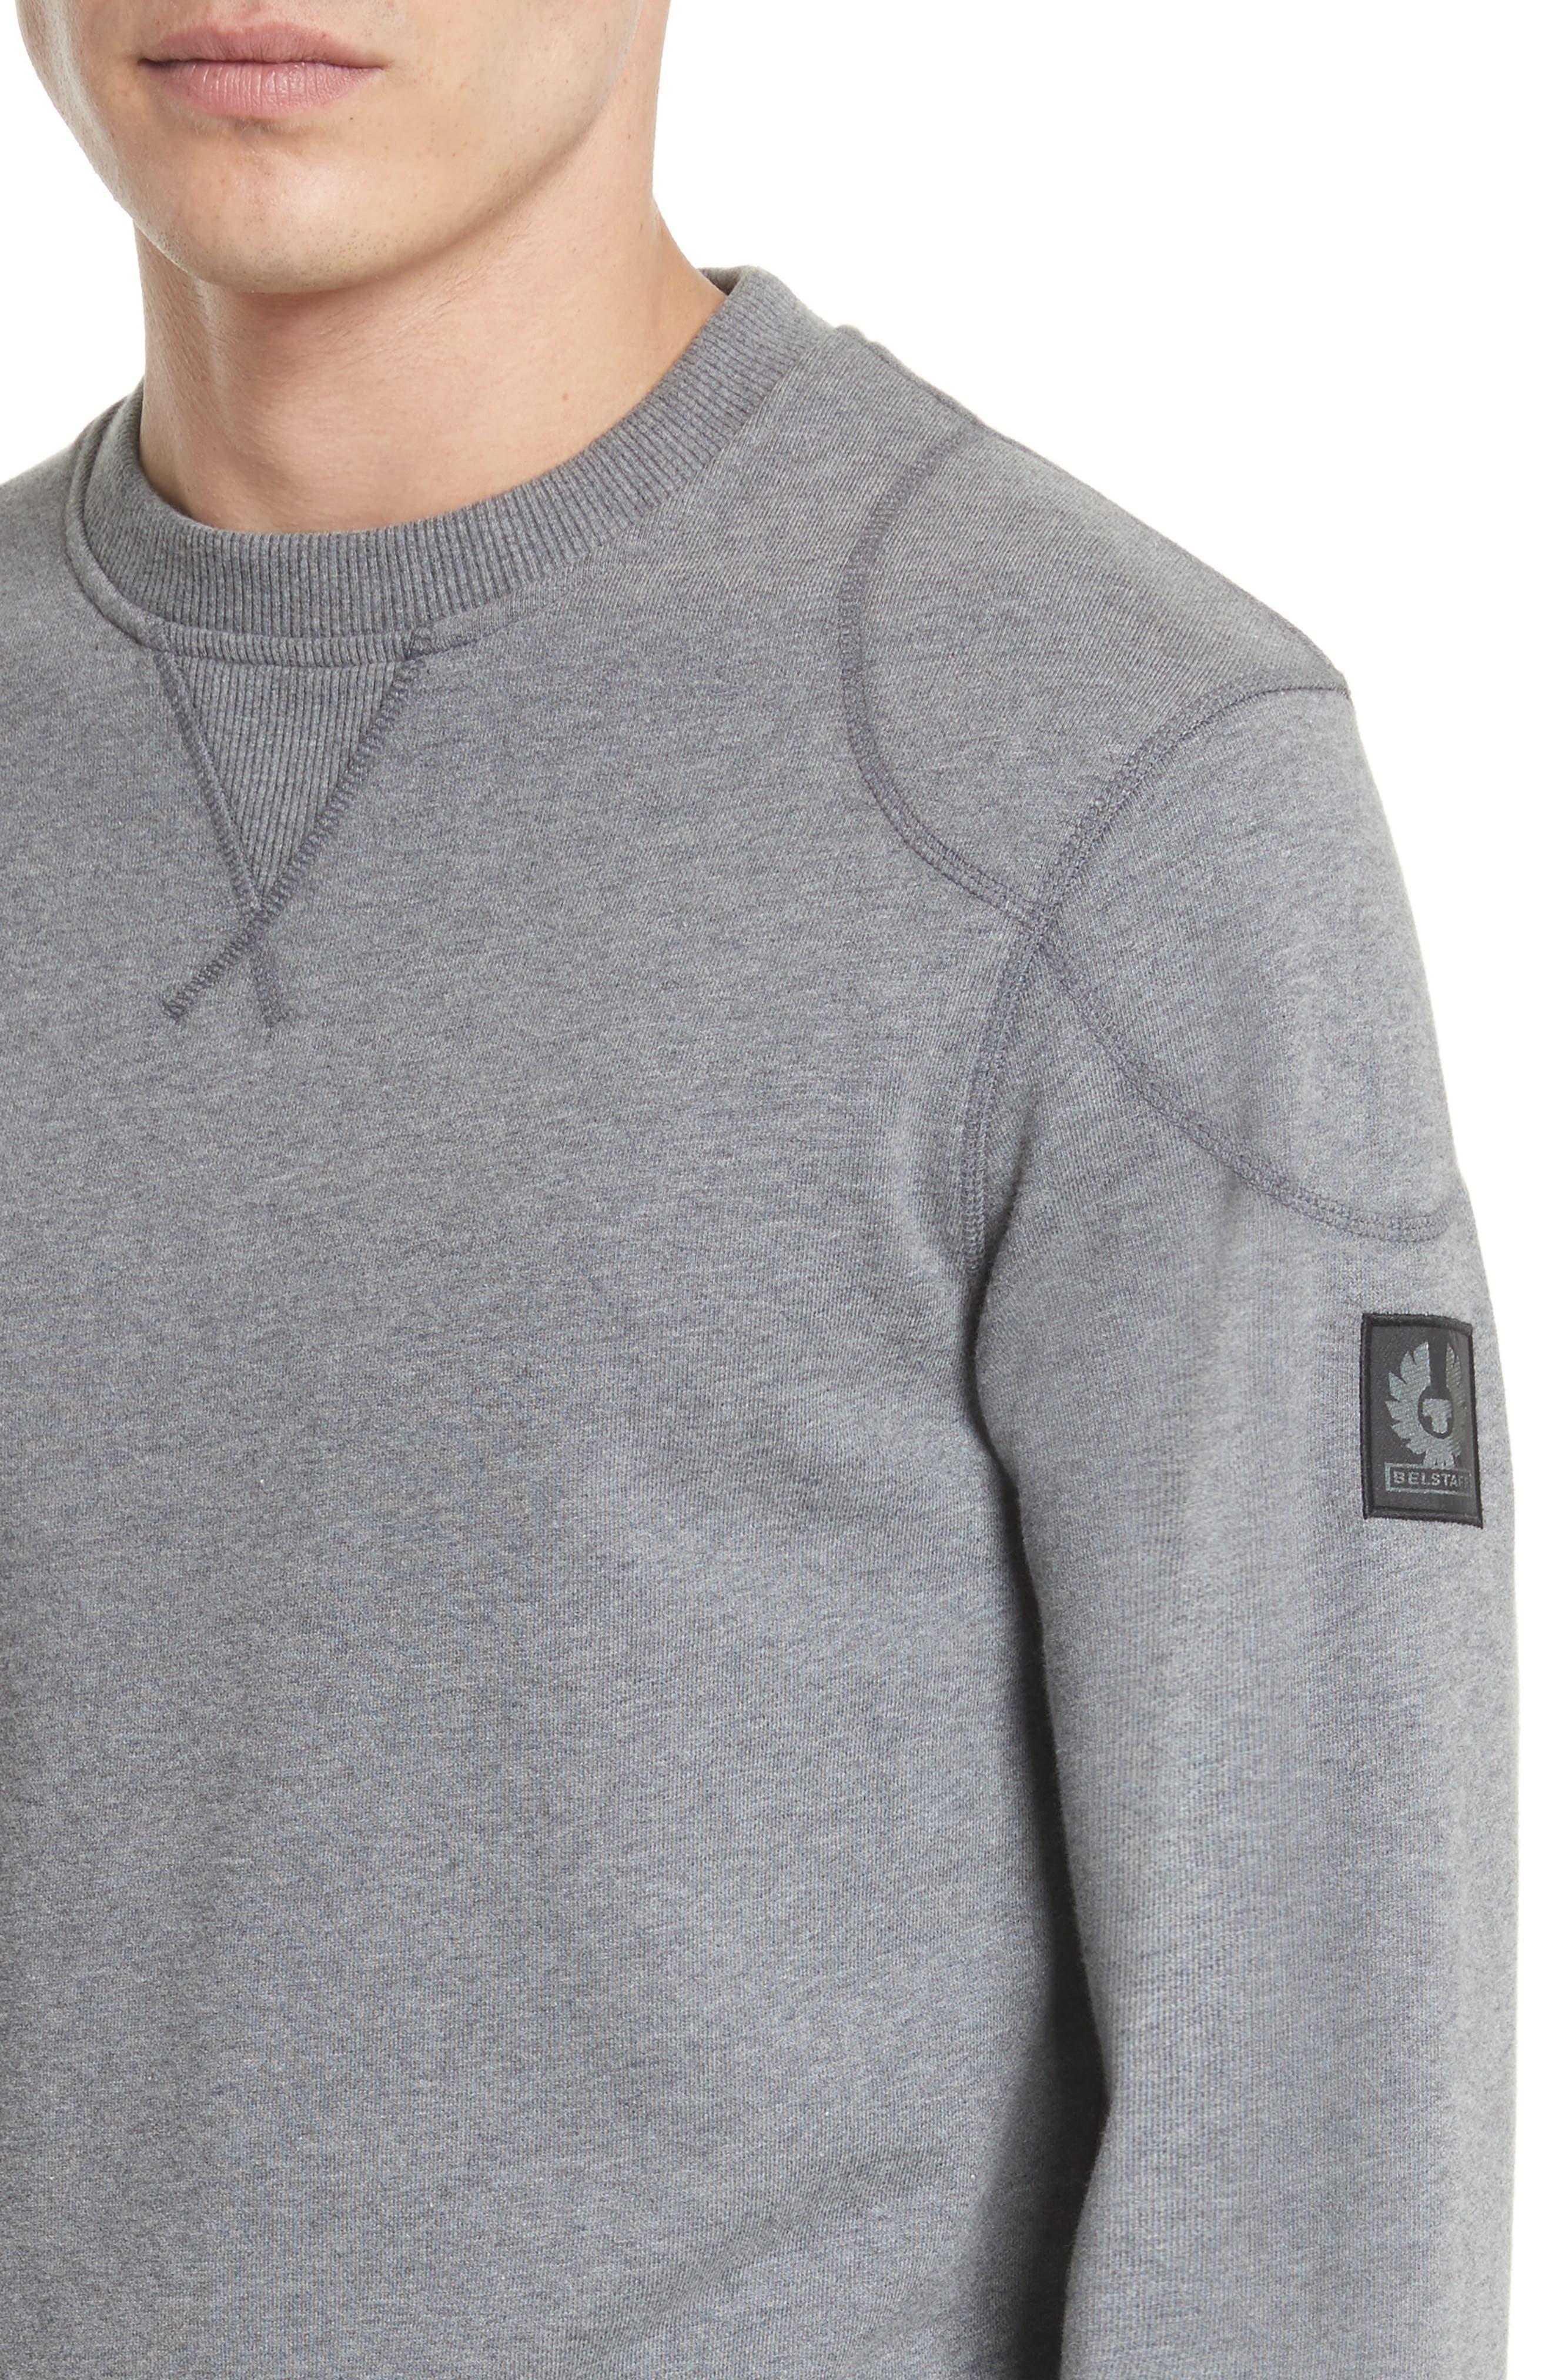 Jefferson Fleece Sweatshirt,                             Alternate thumbnail 4, color,                             Dark Grey Mel